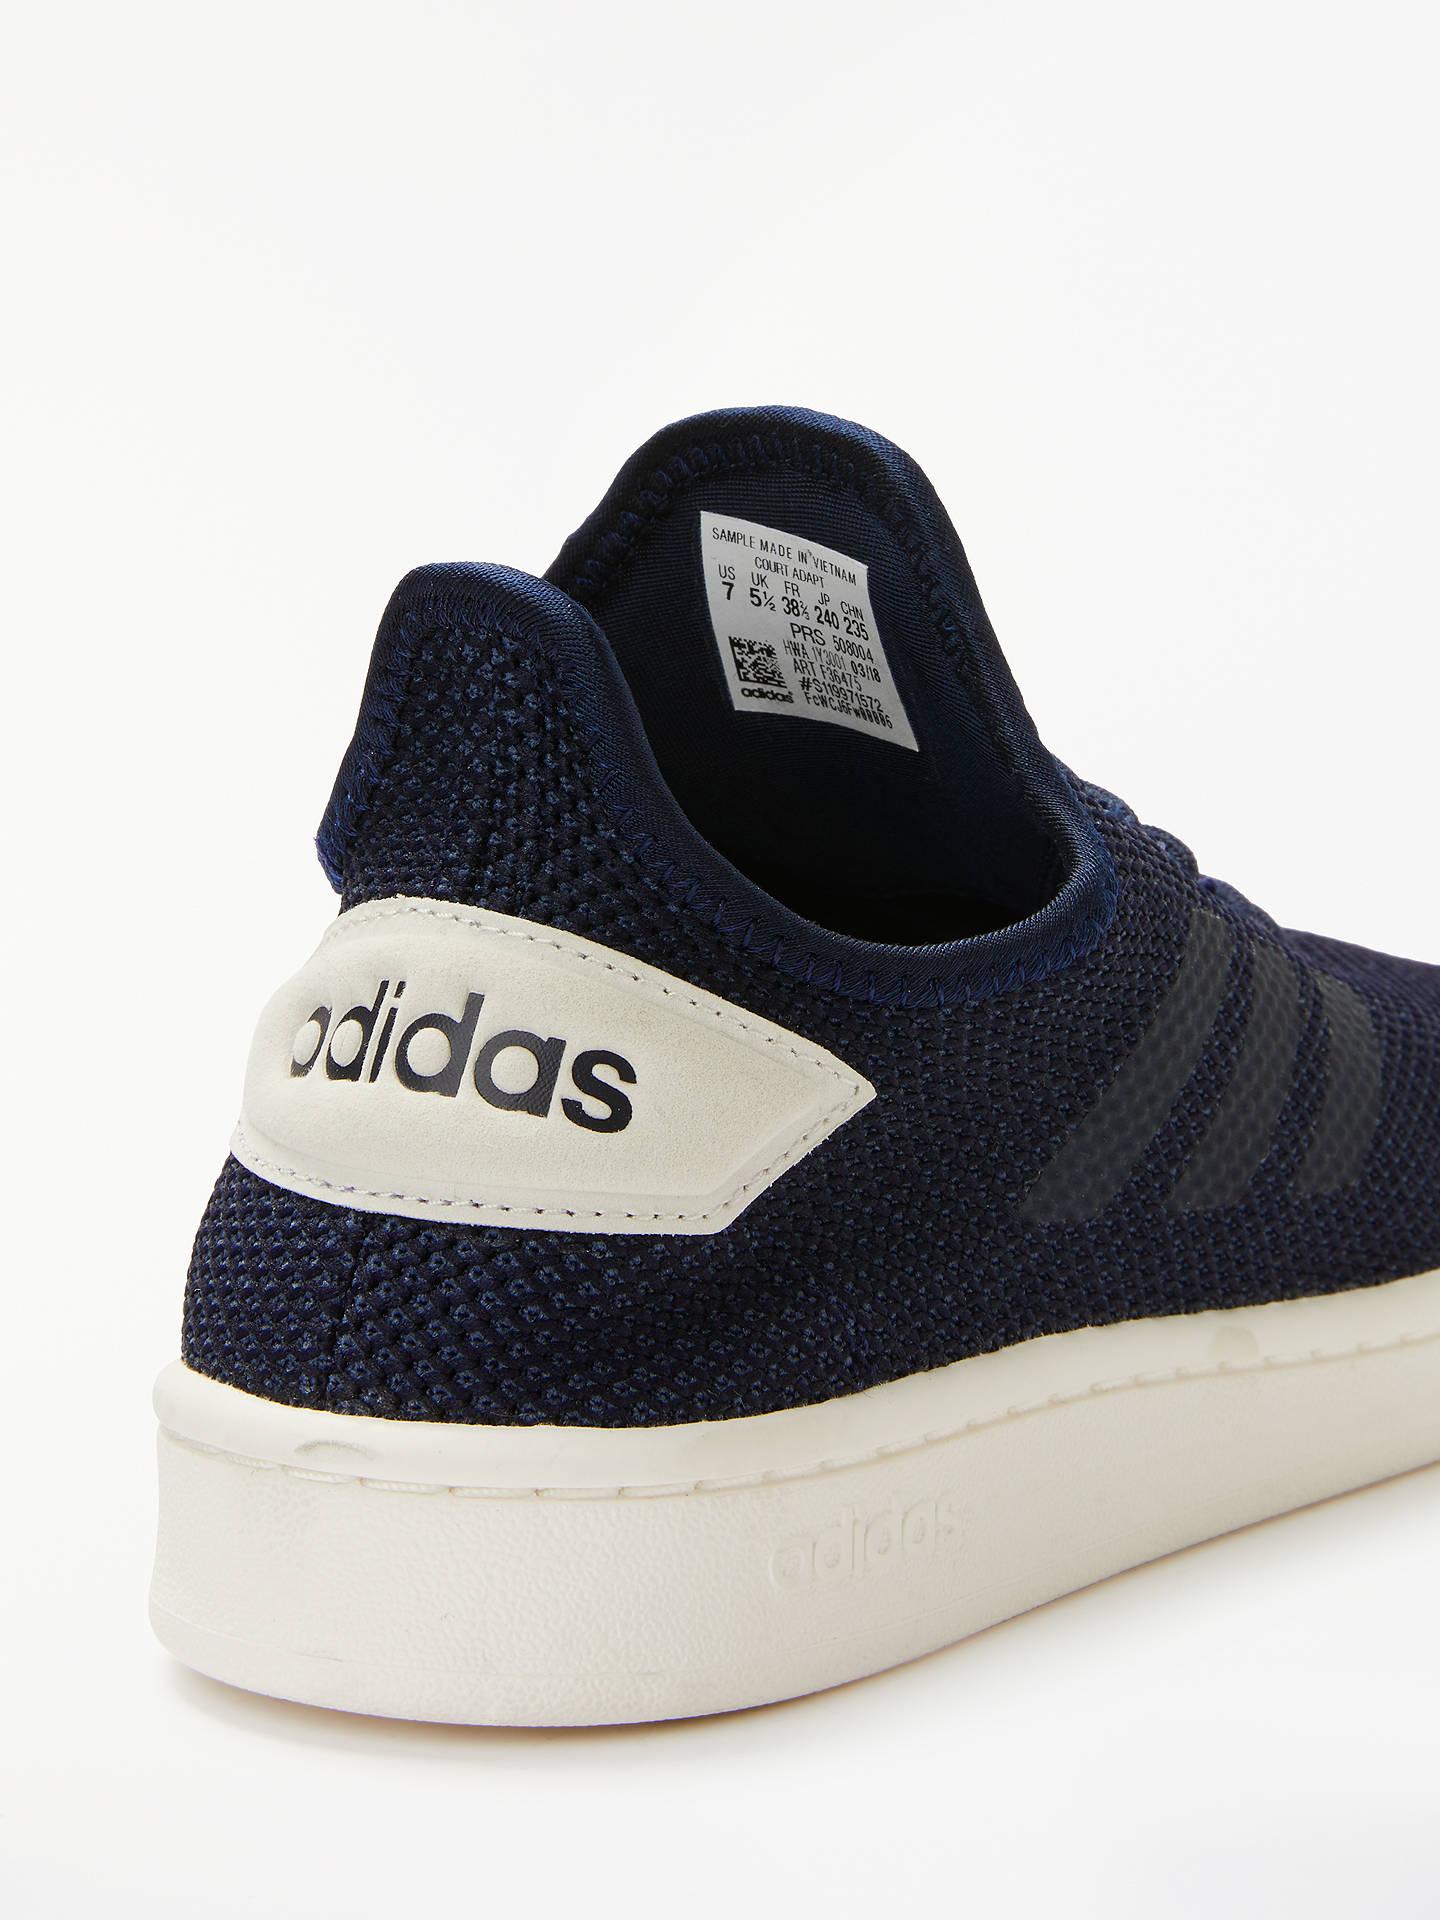 adidas court adap